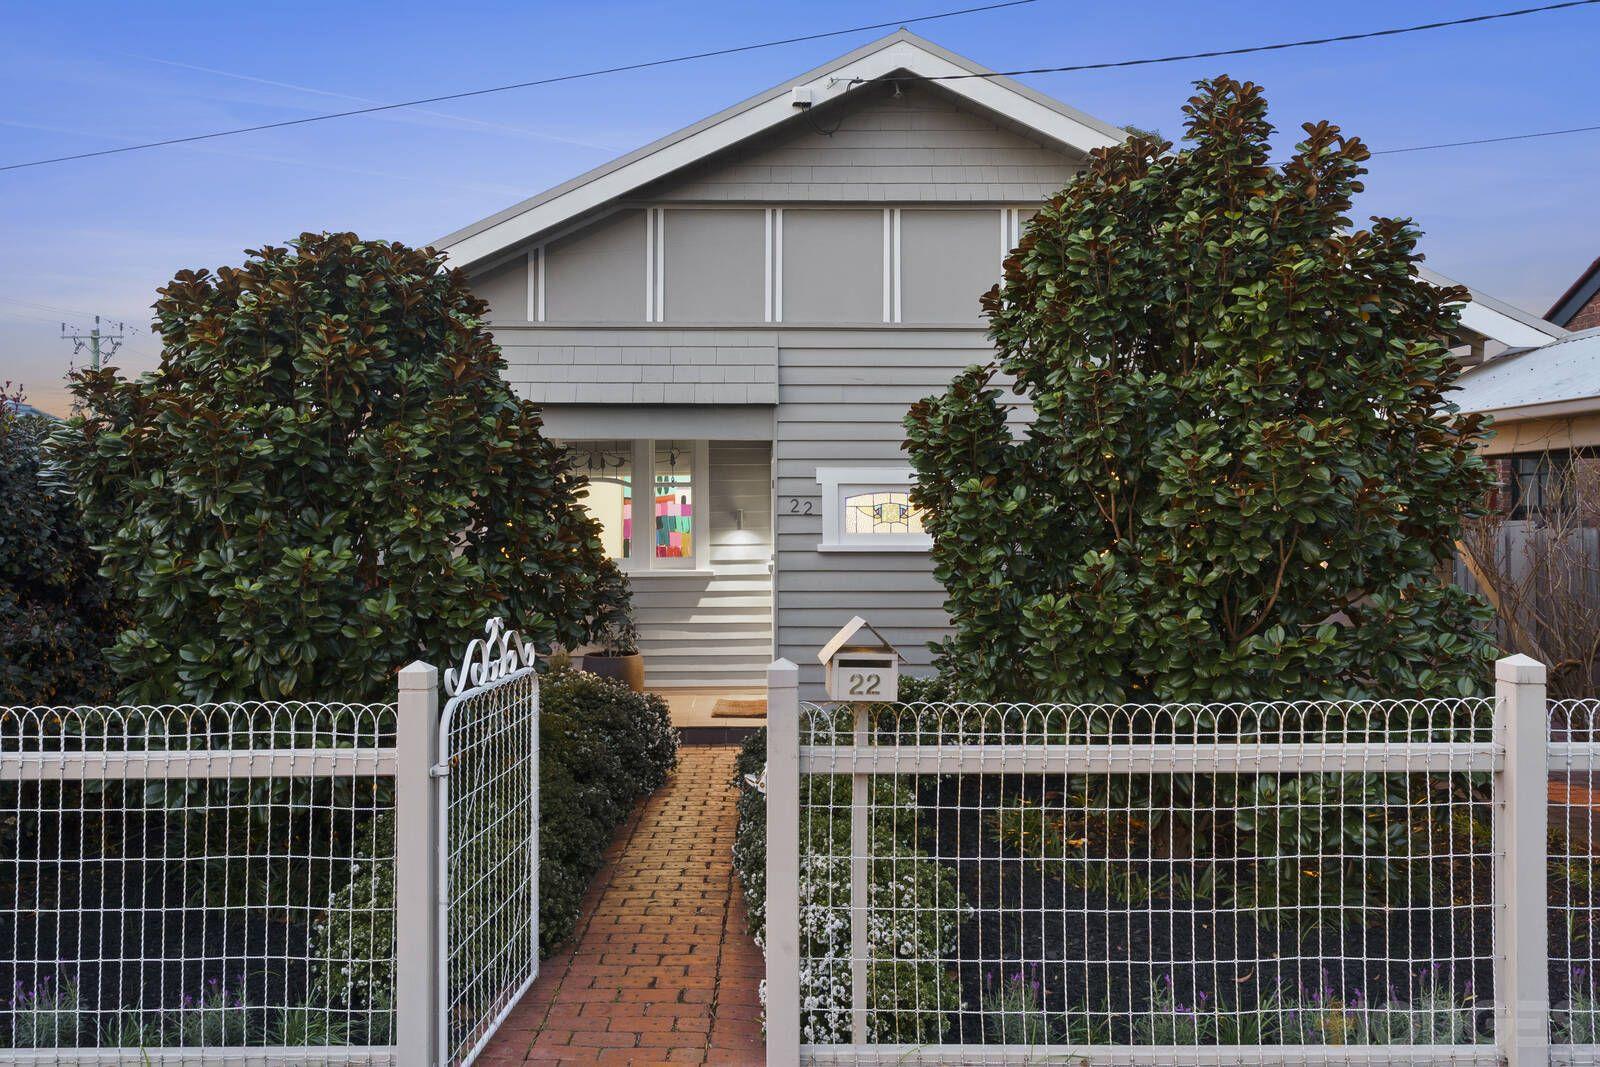 22 John Street, Geelong West VIC 3218, Image 0